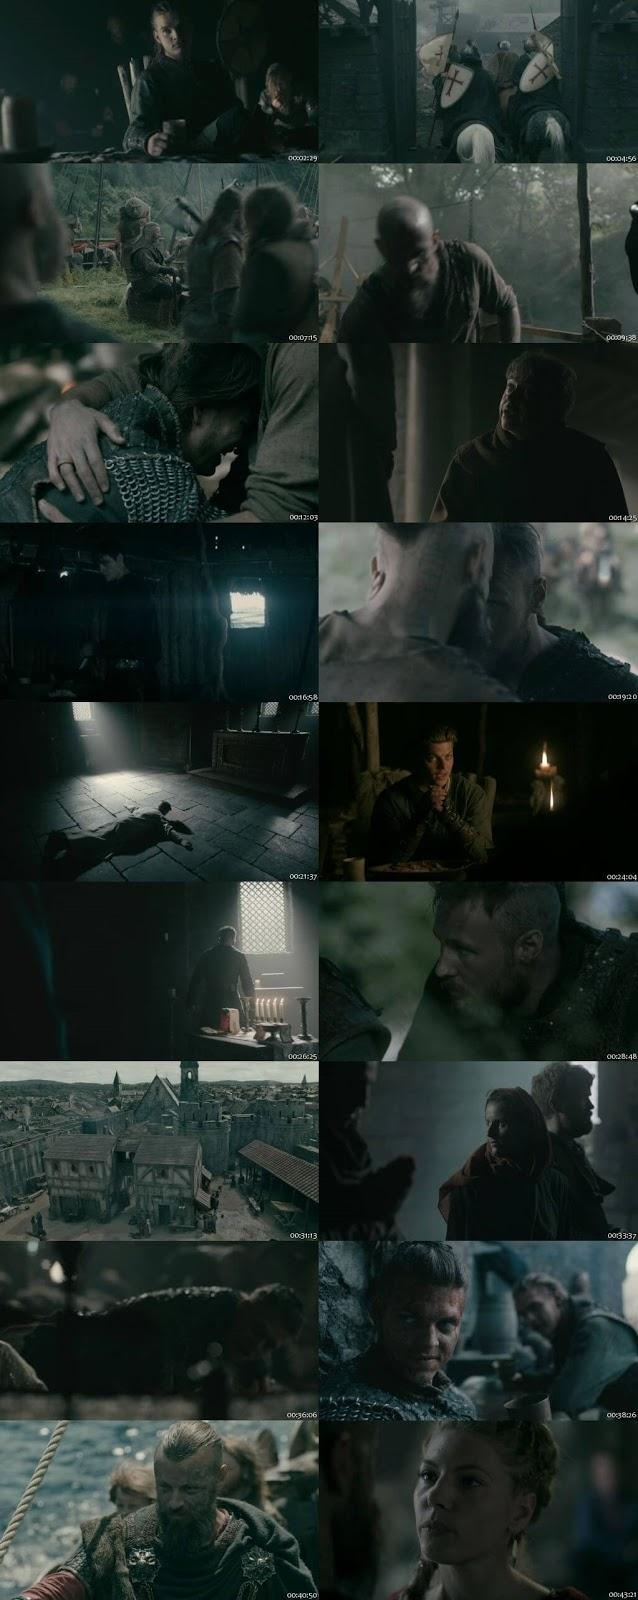 Vikings S05E01 370MB WEBRip 720p ESubs